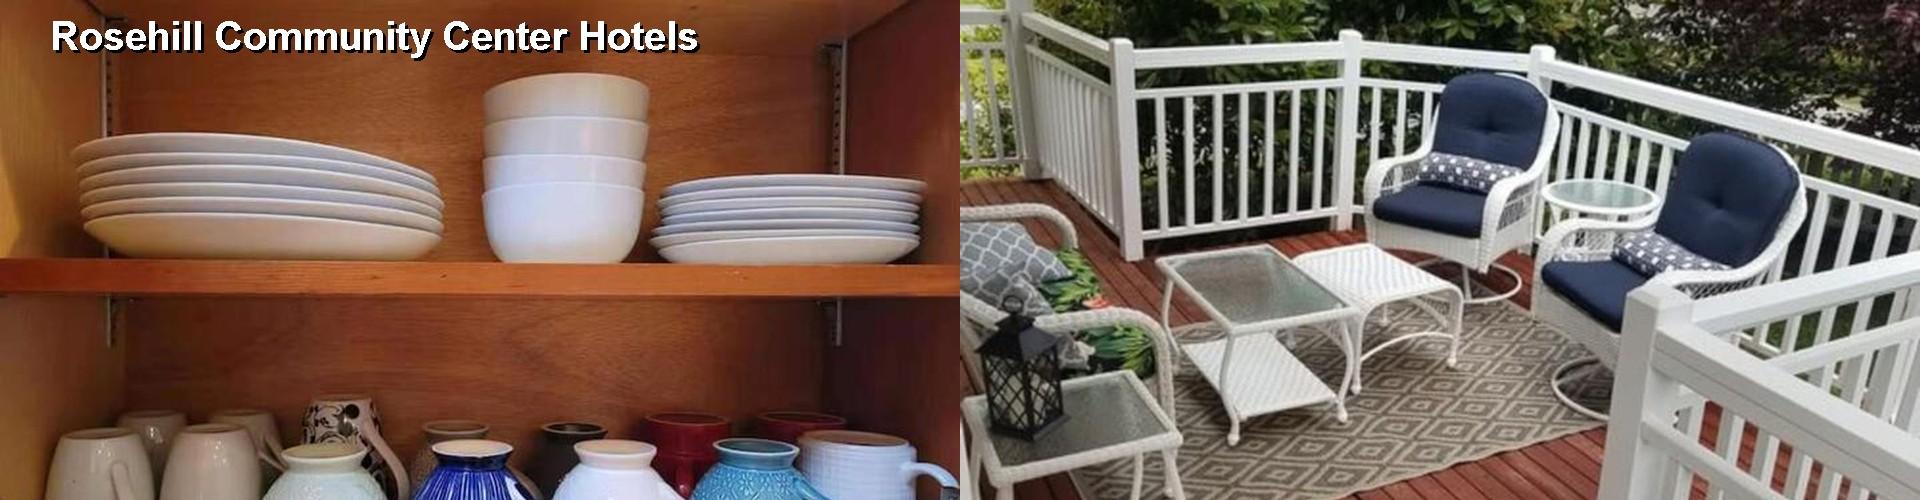 5 Best Hotels Near Rosehill Community Center